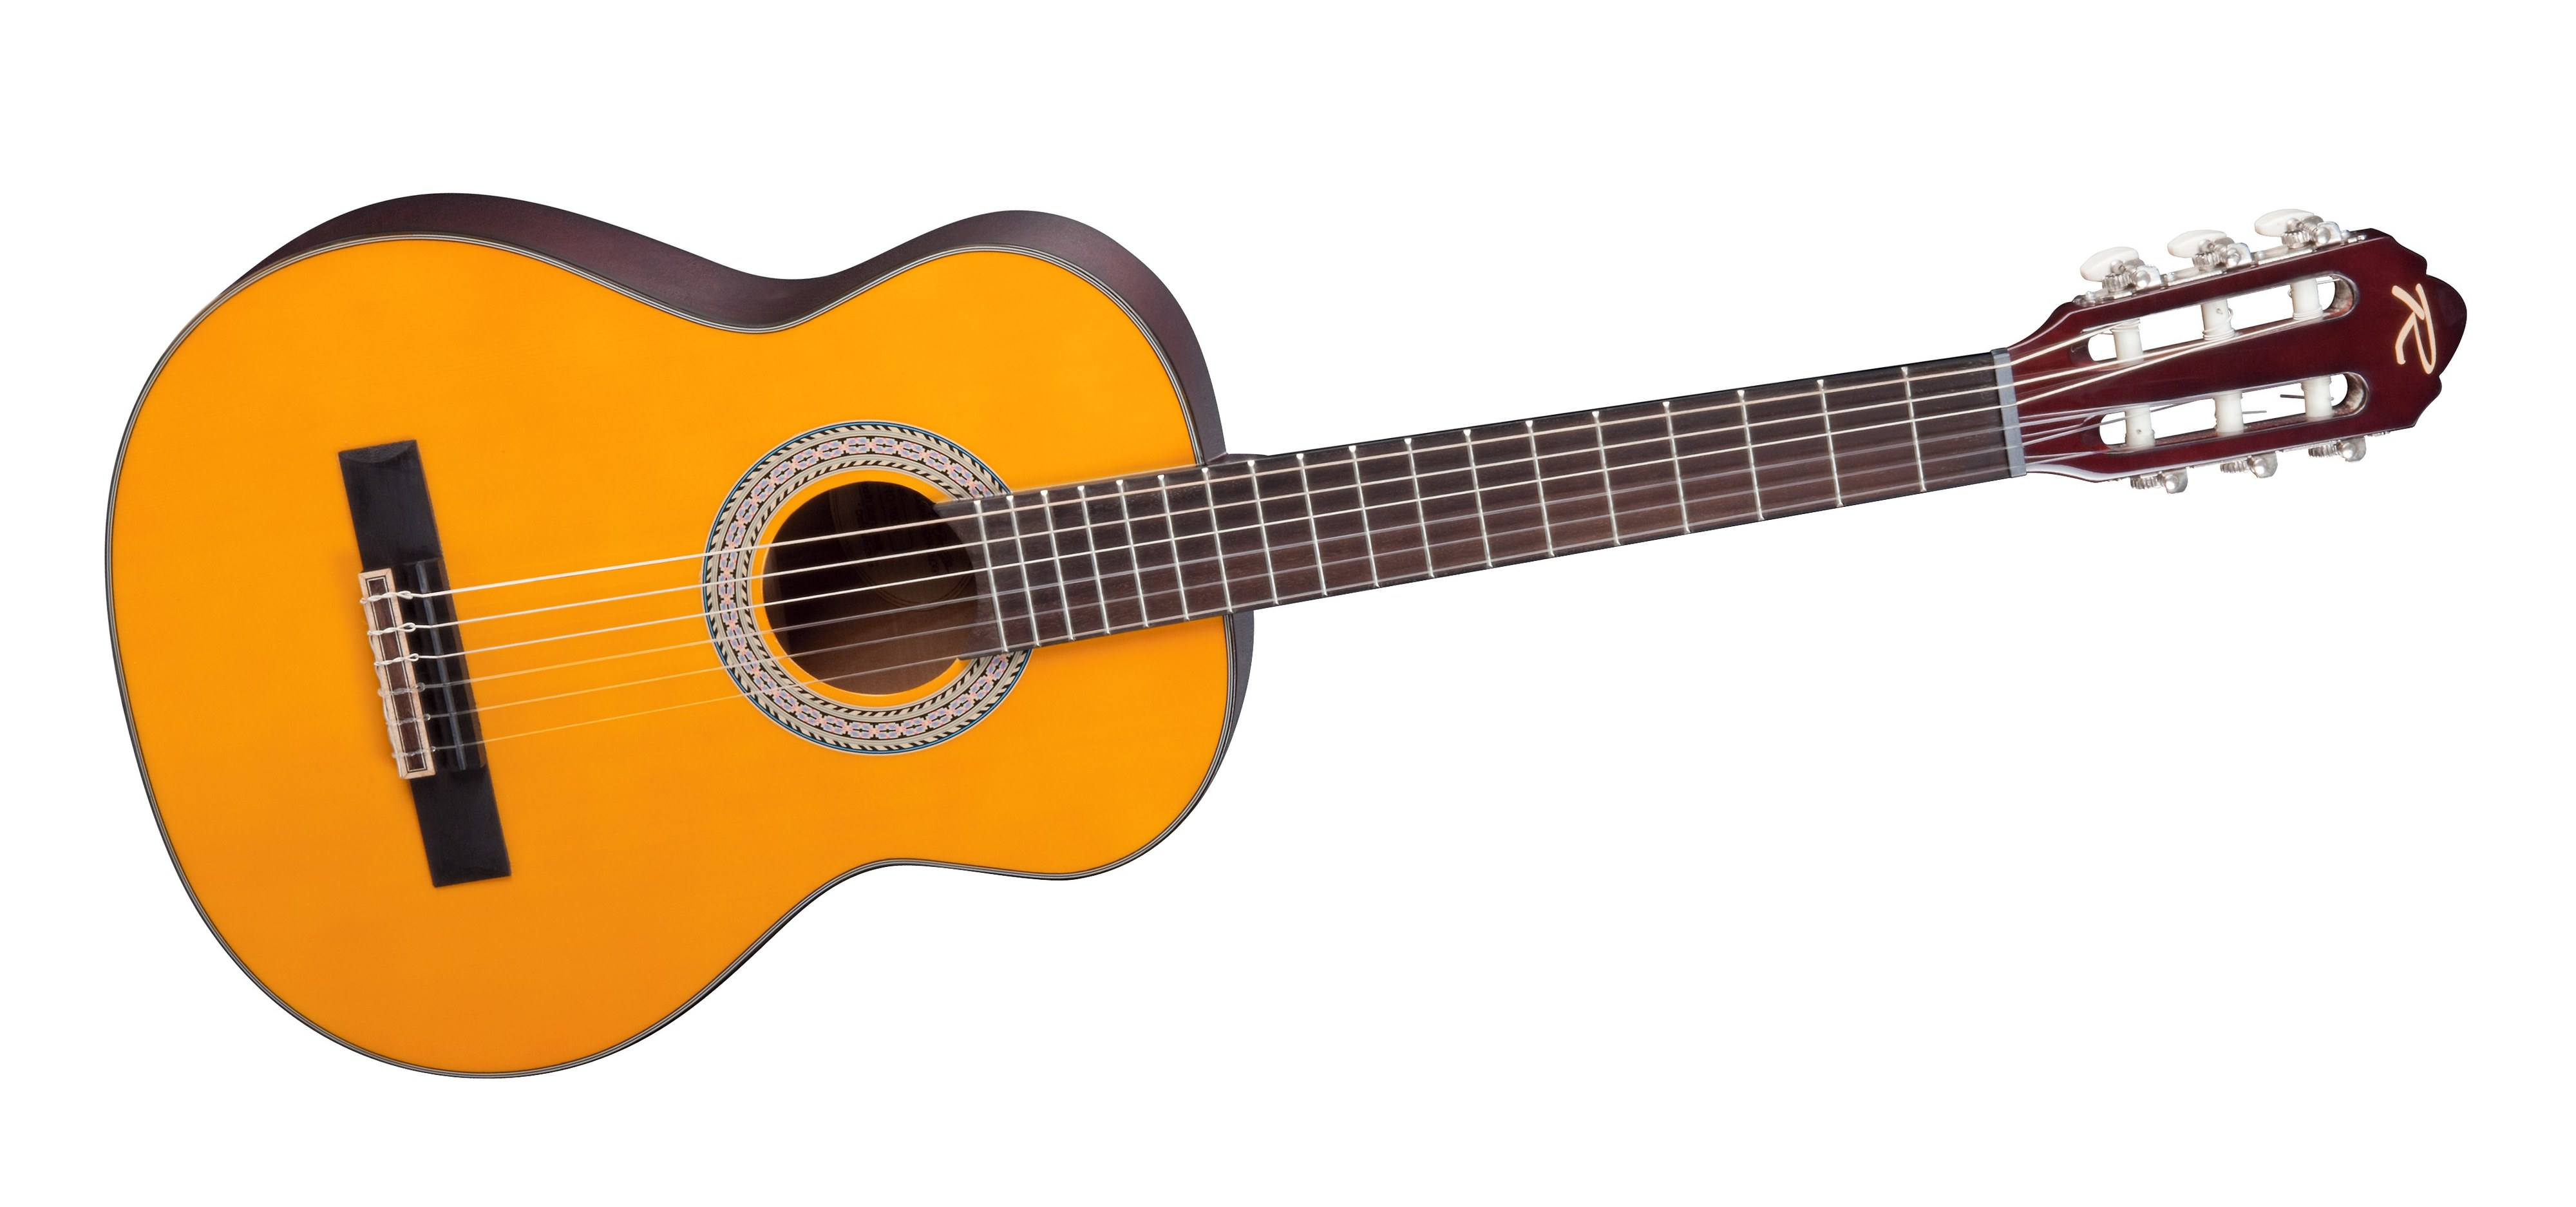 RENO RC160N Classical Guitar - 3/4 size